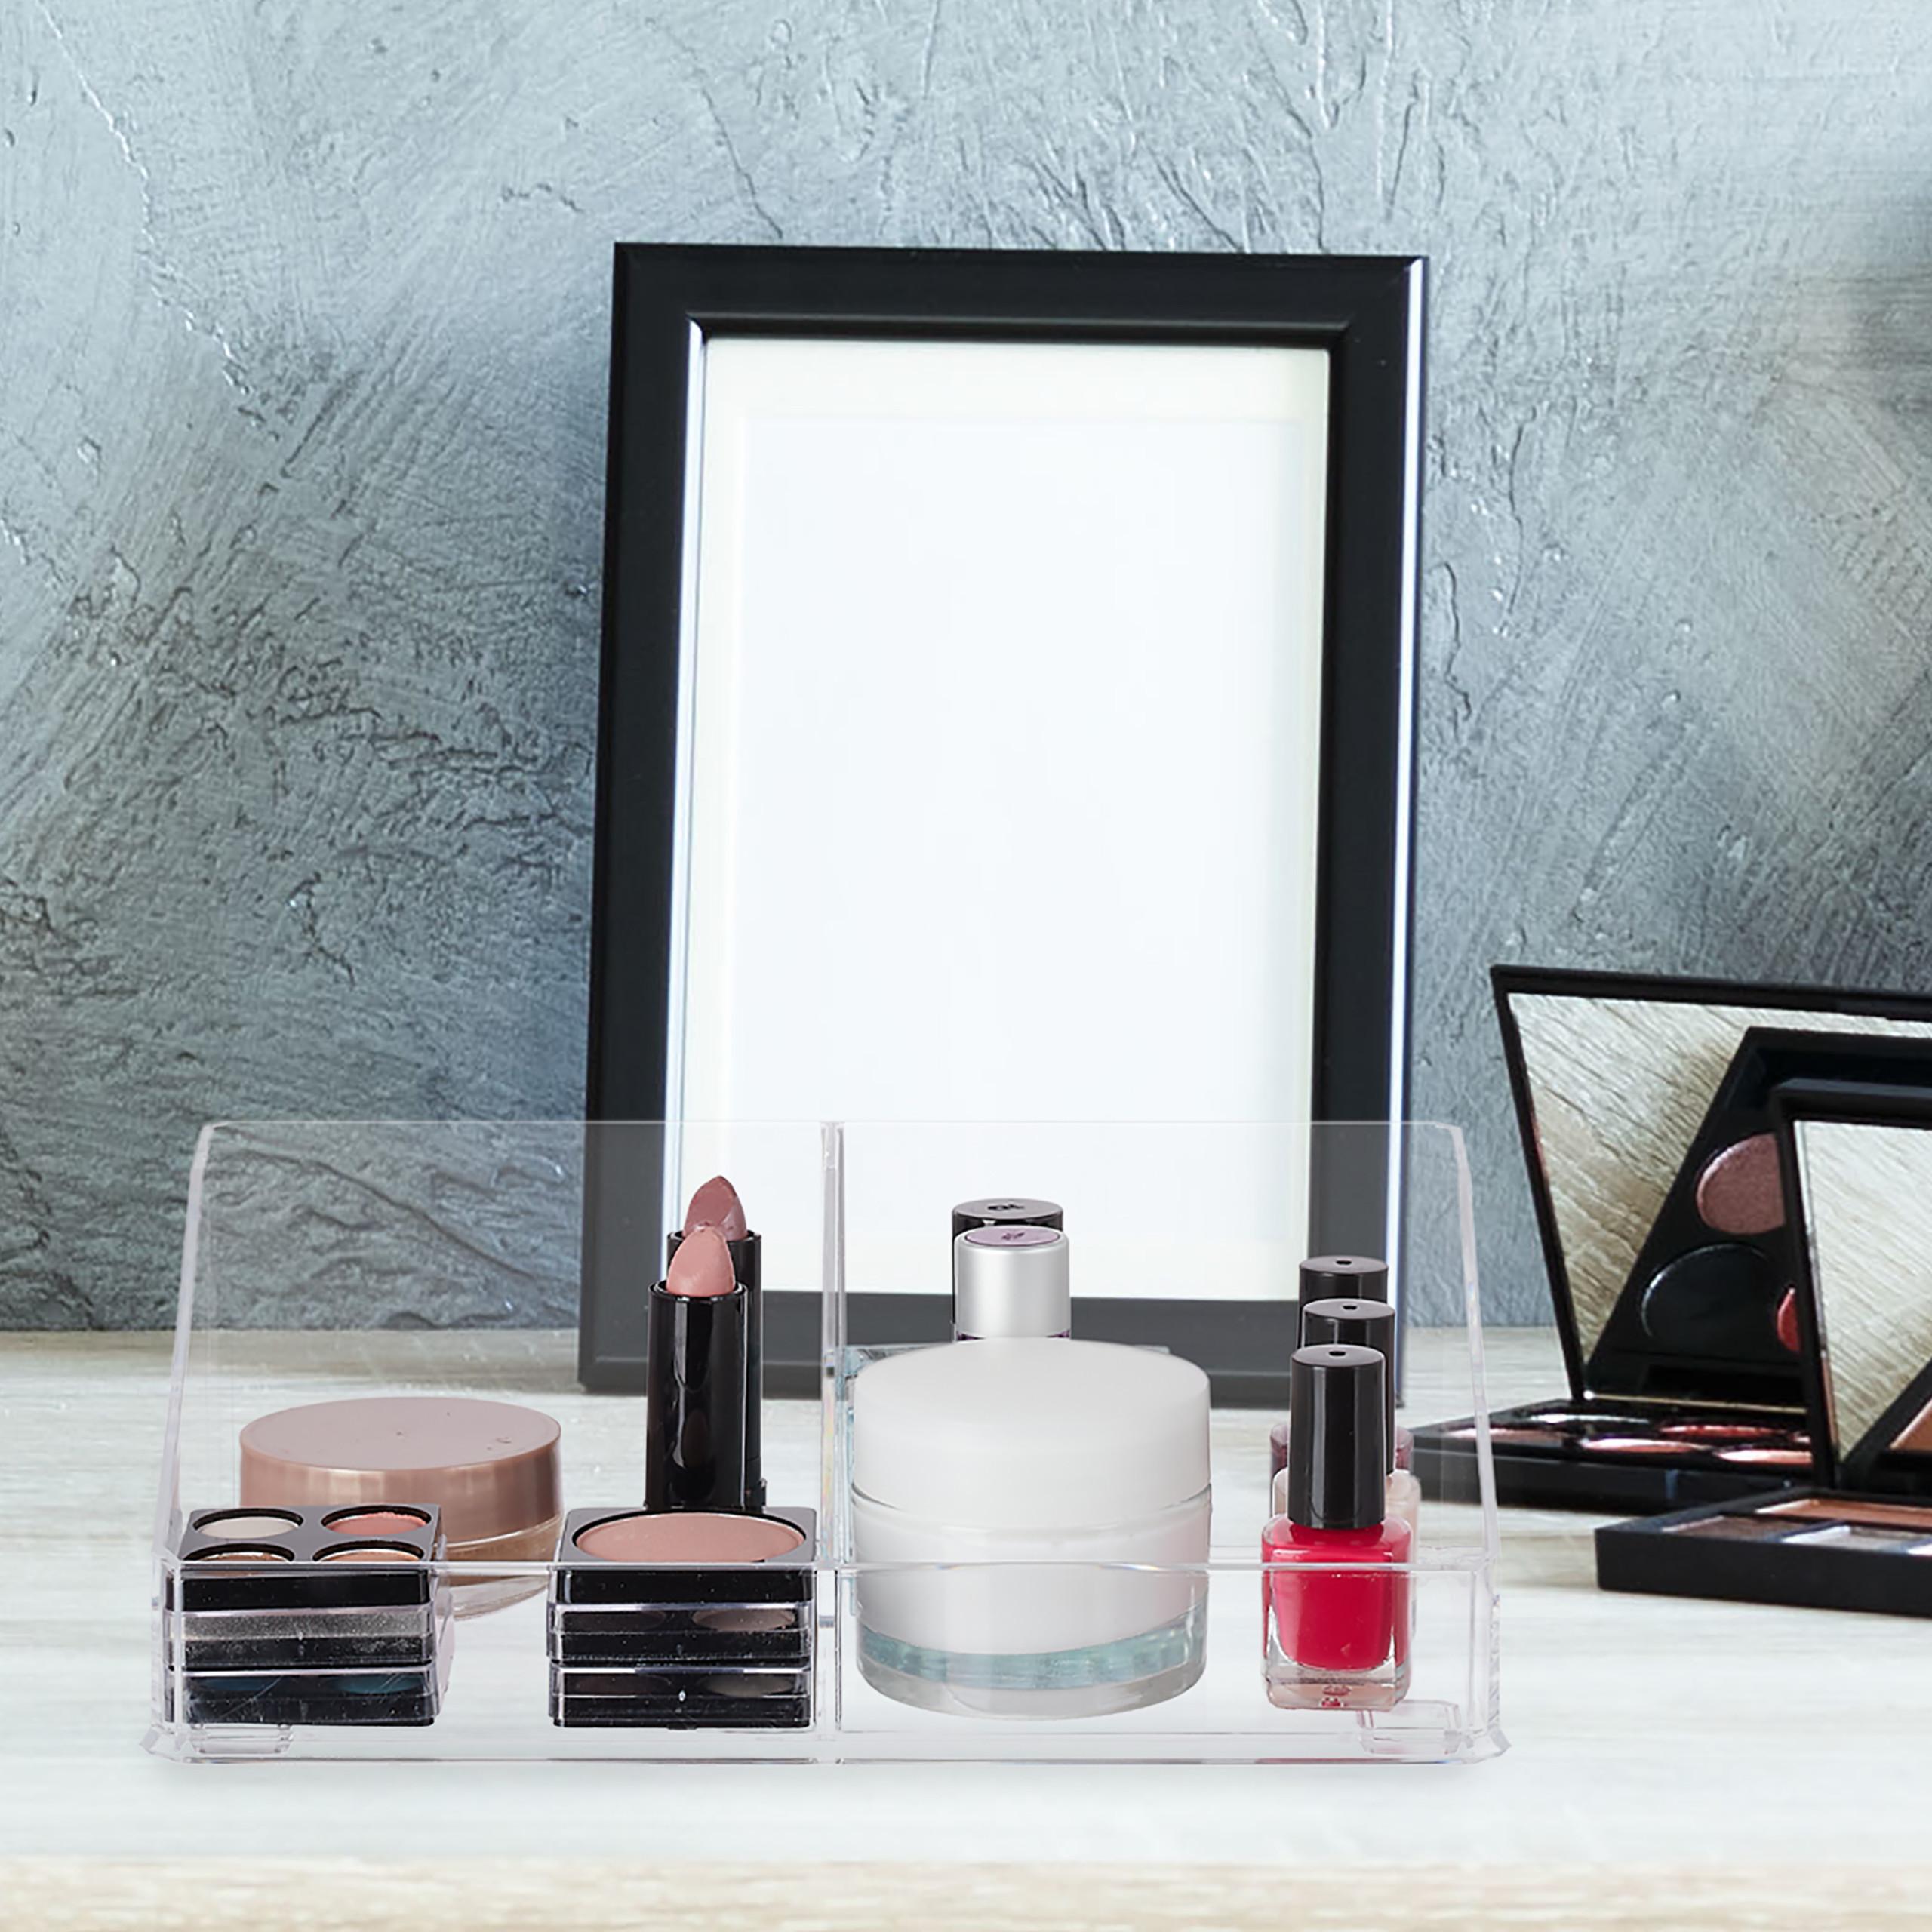 make-up-organizer-cosmetica-organizer-acryl-2-vakken-badkamer-opbergen miniatuur 4